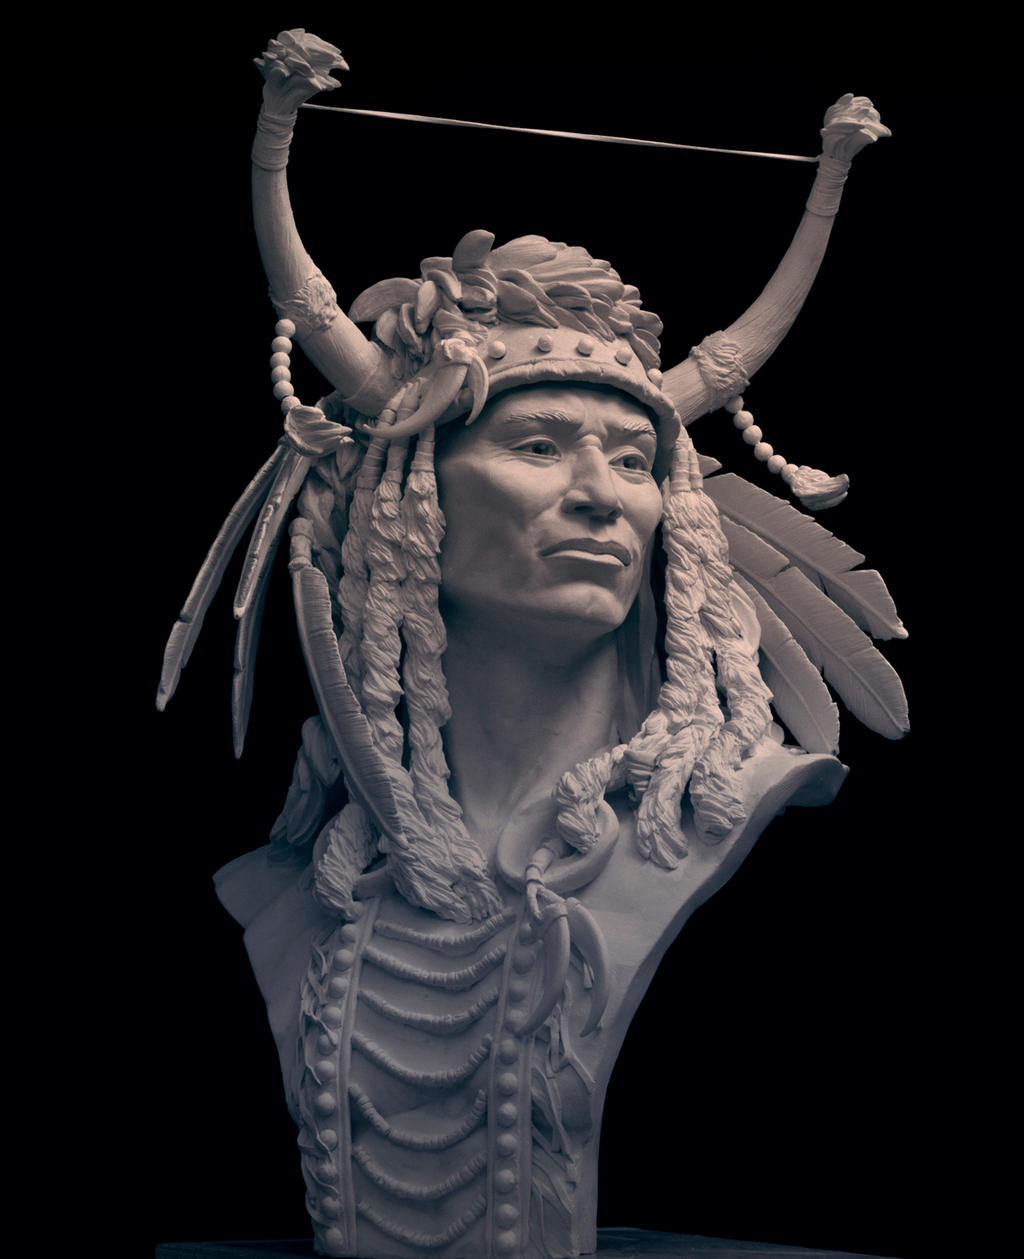 warrior with splithorn warbonnet-2 by renemarcel27